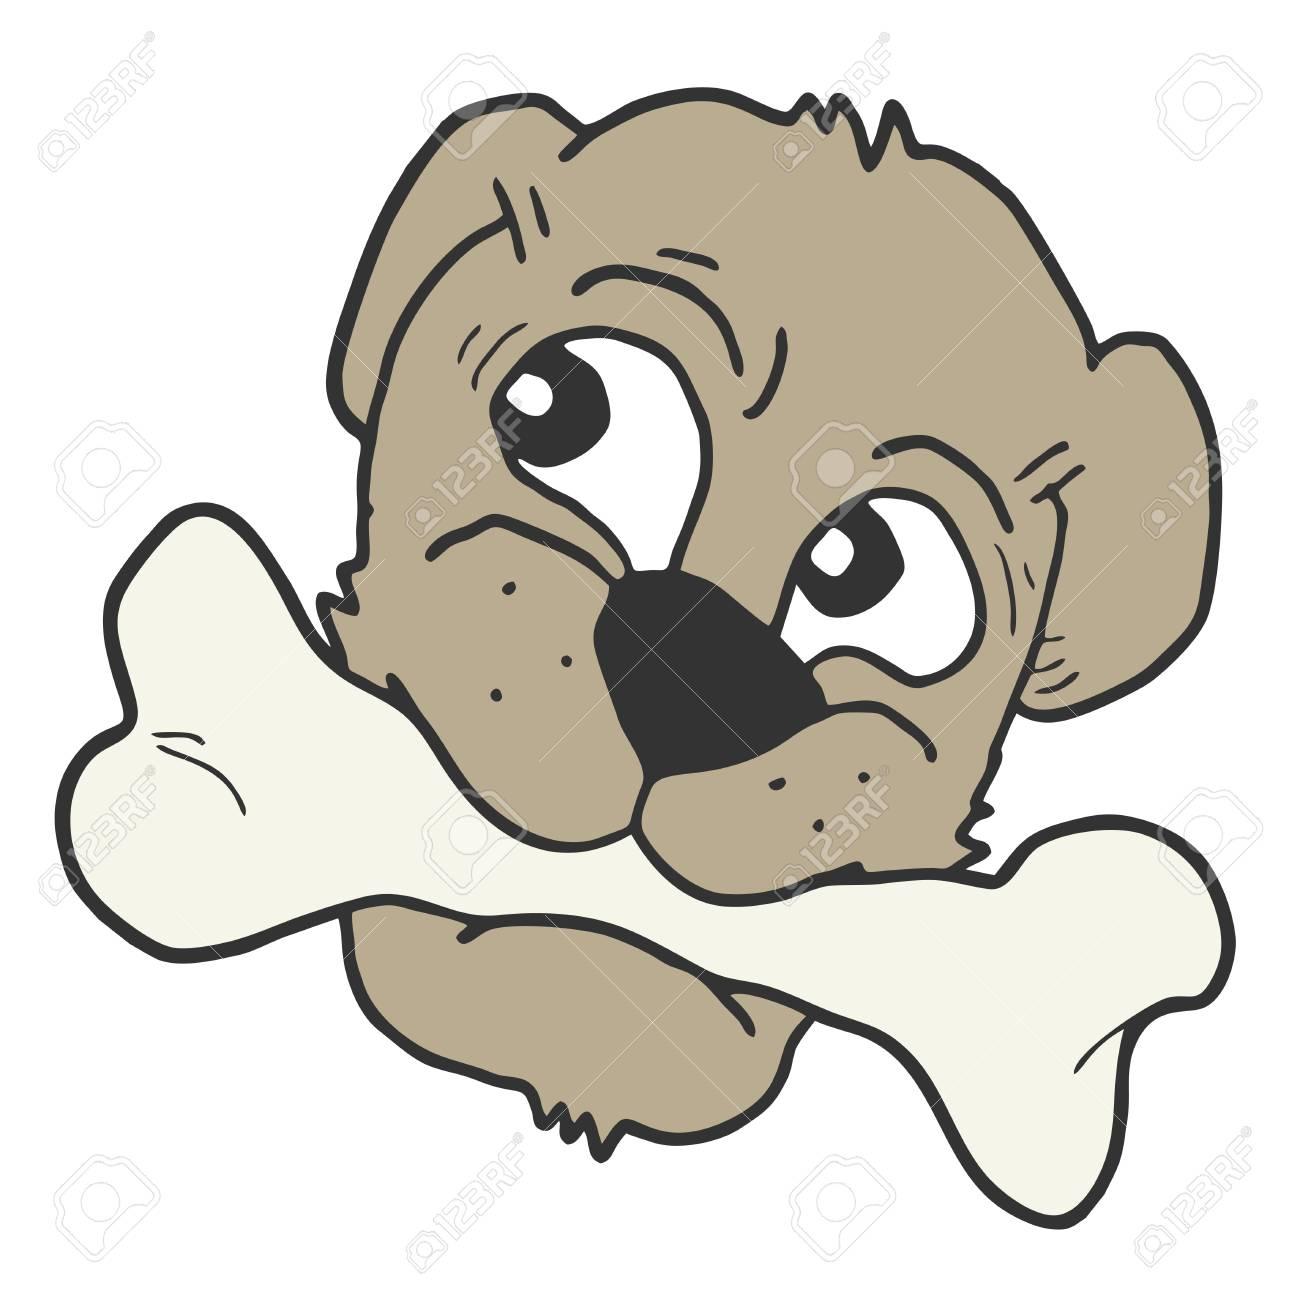 Funny pet Stock Vector - 17509536